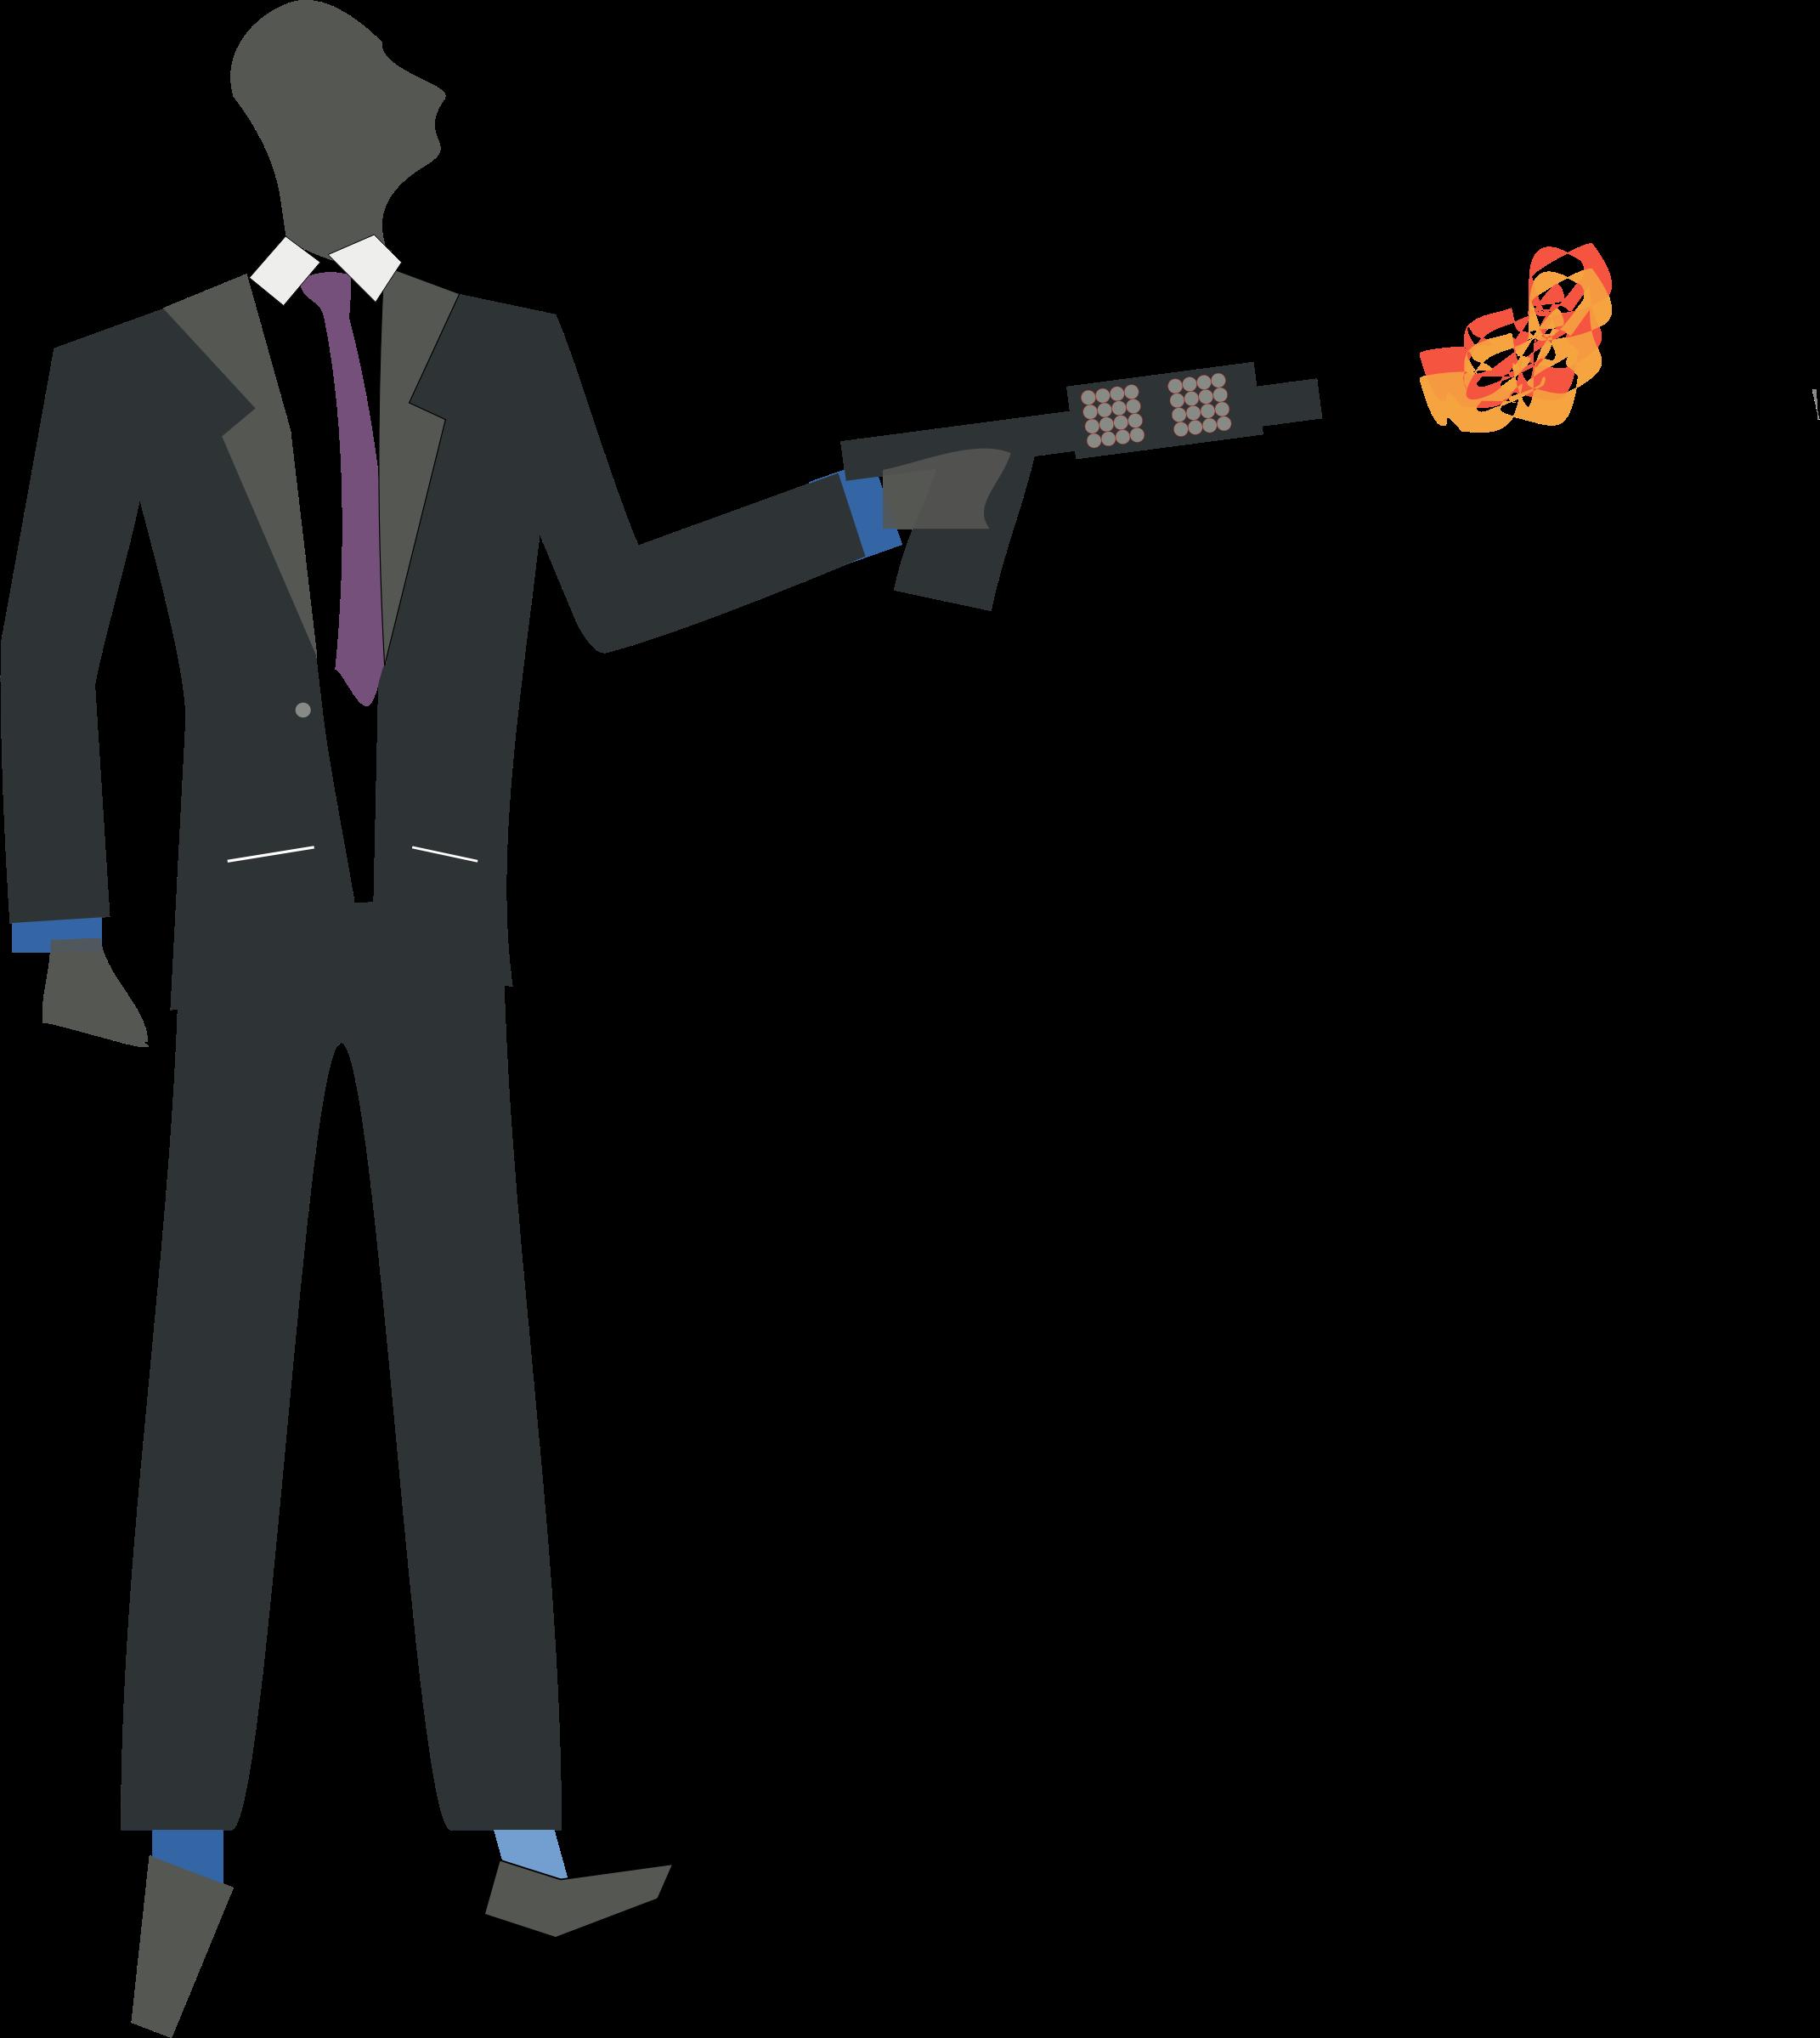 Clipart gun flamethrower. Oxidation torch big image